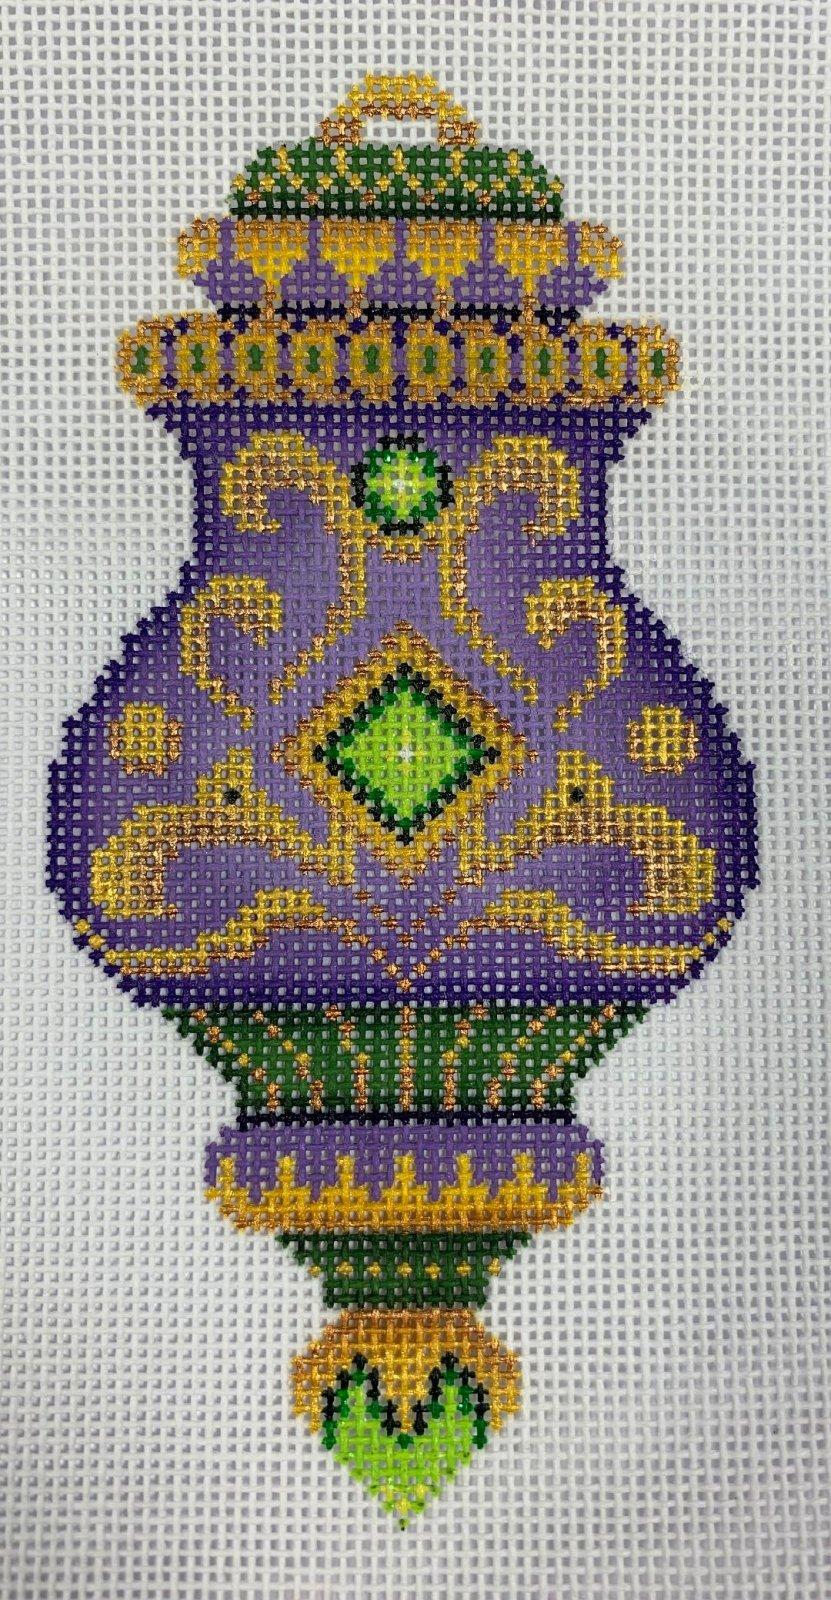 K&B Jeweled Christmas Ball Purple Gold Forest Green 18ct Mesh